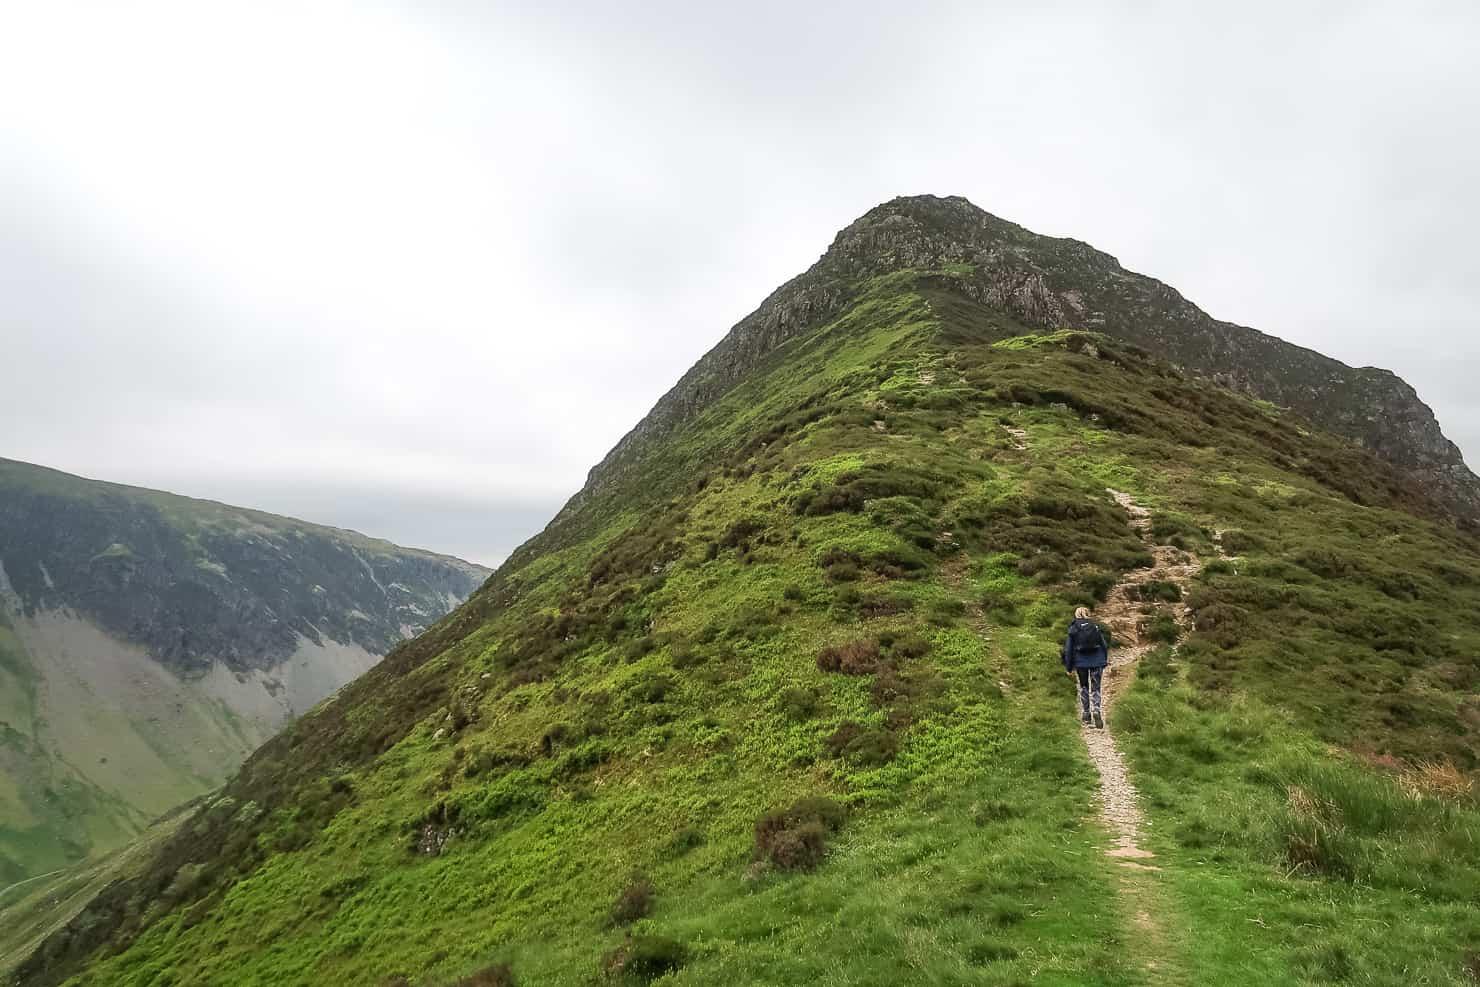 Hiking up Fleetwith Pike